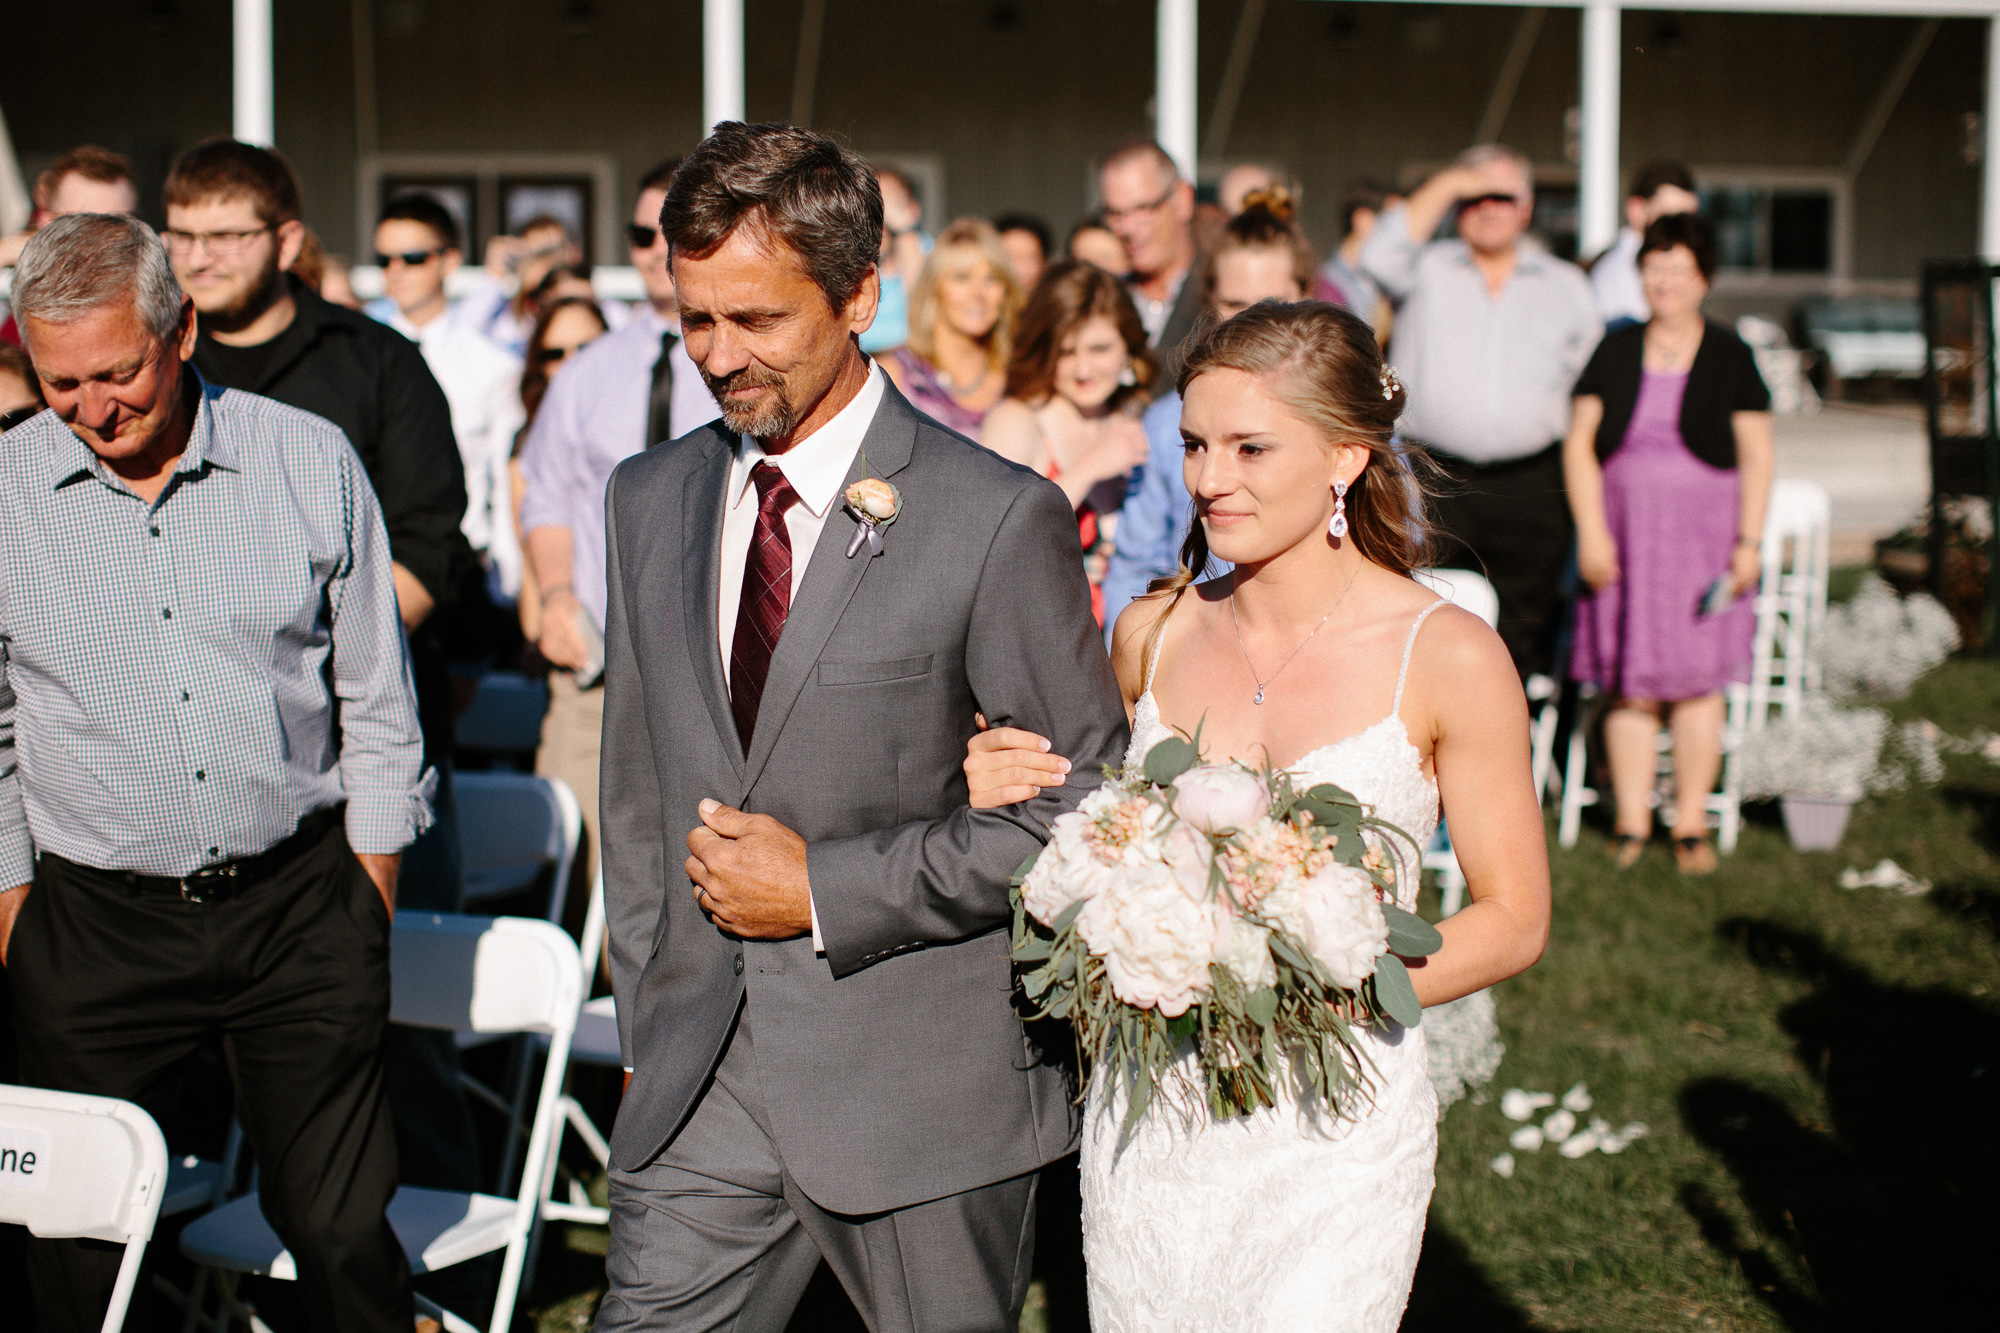 wedding-elopement-adventerous-romantic-timeless-south-dakota-blue-haven-barn-037.jpg